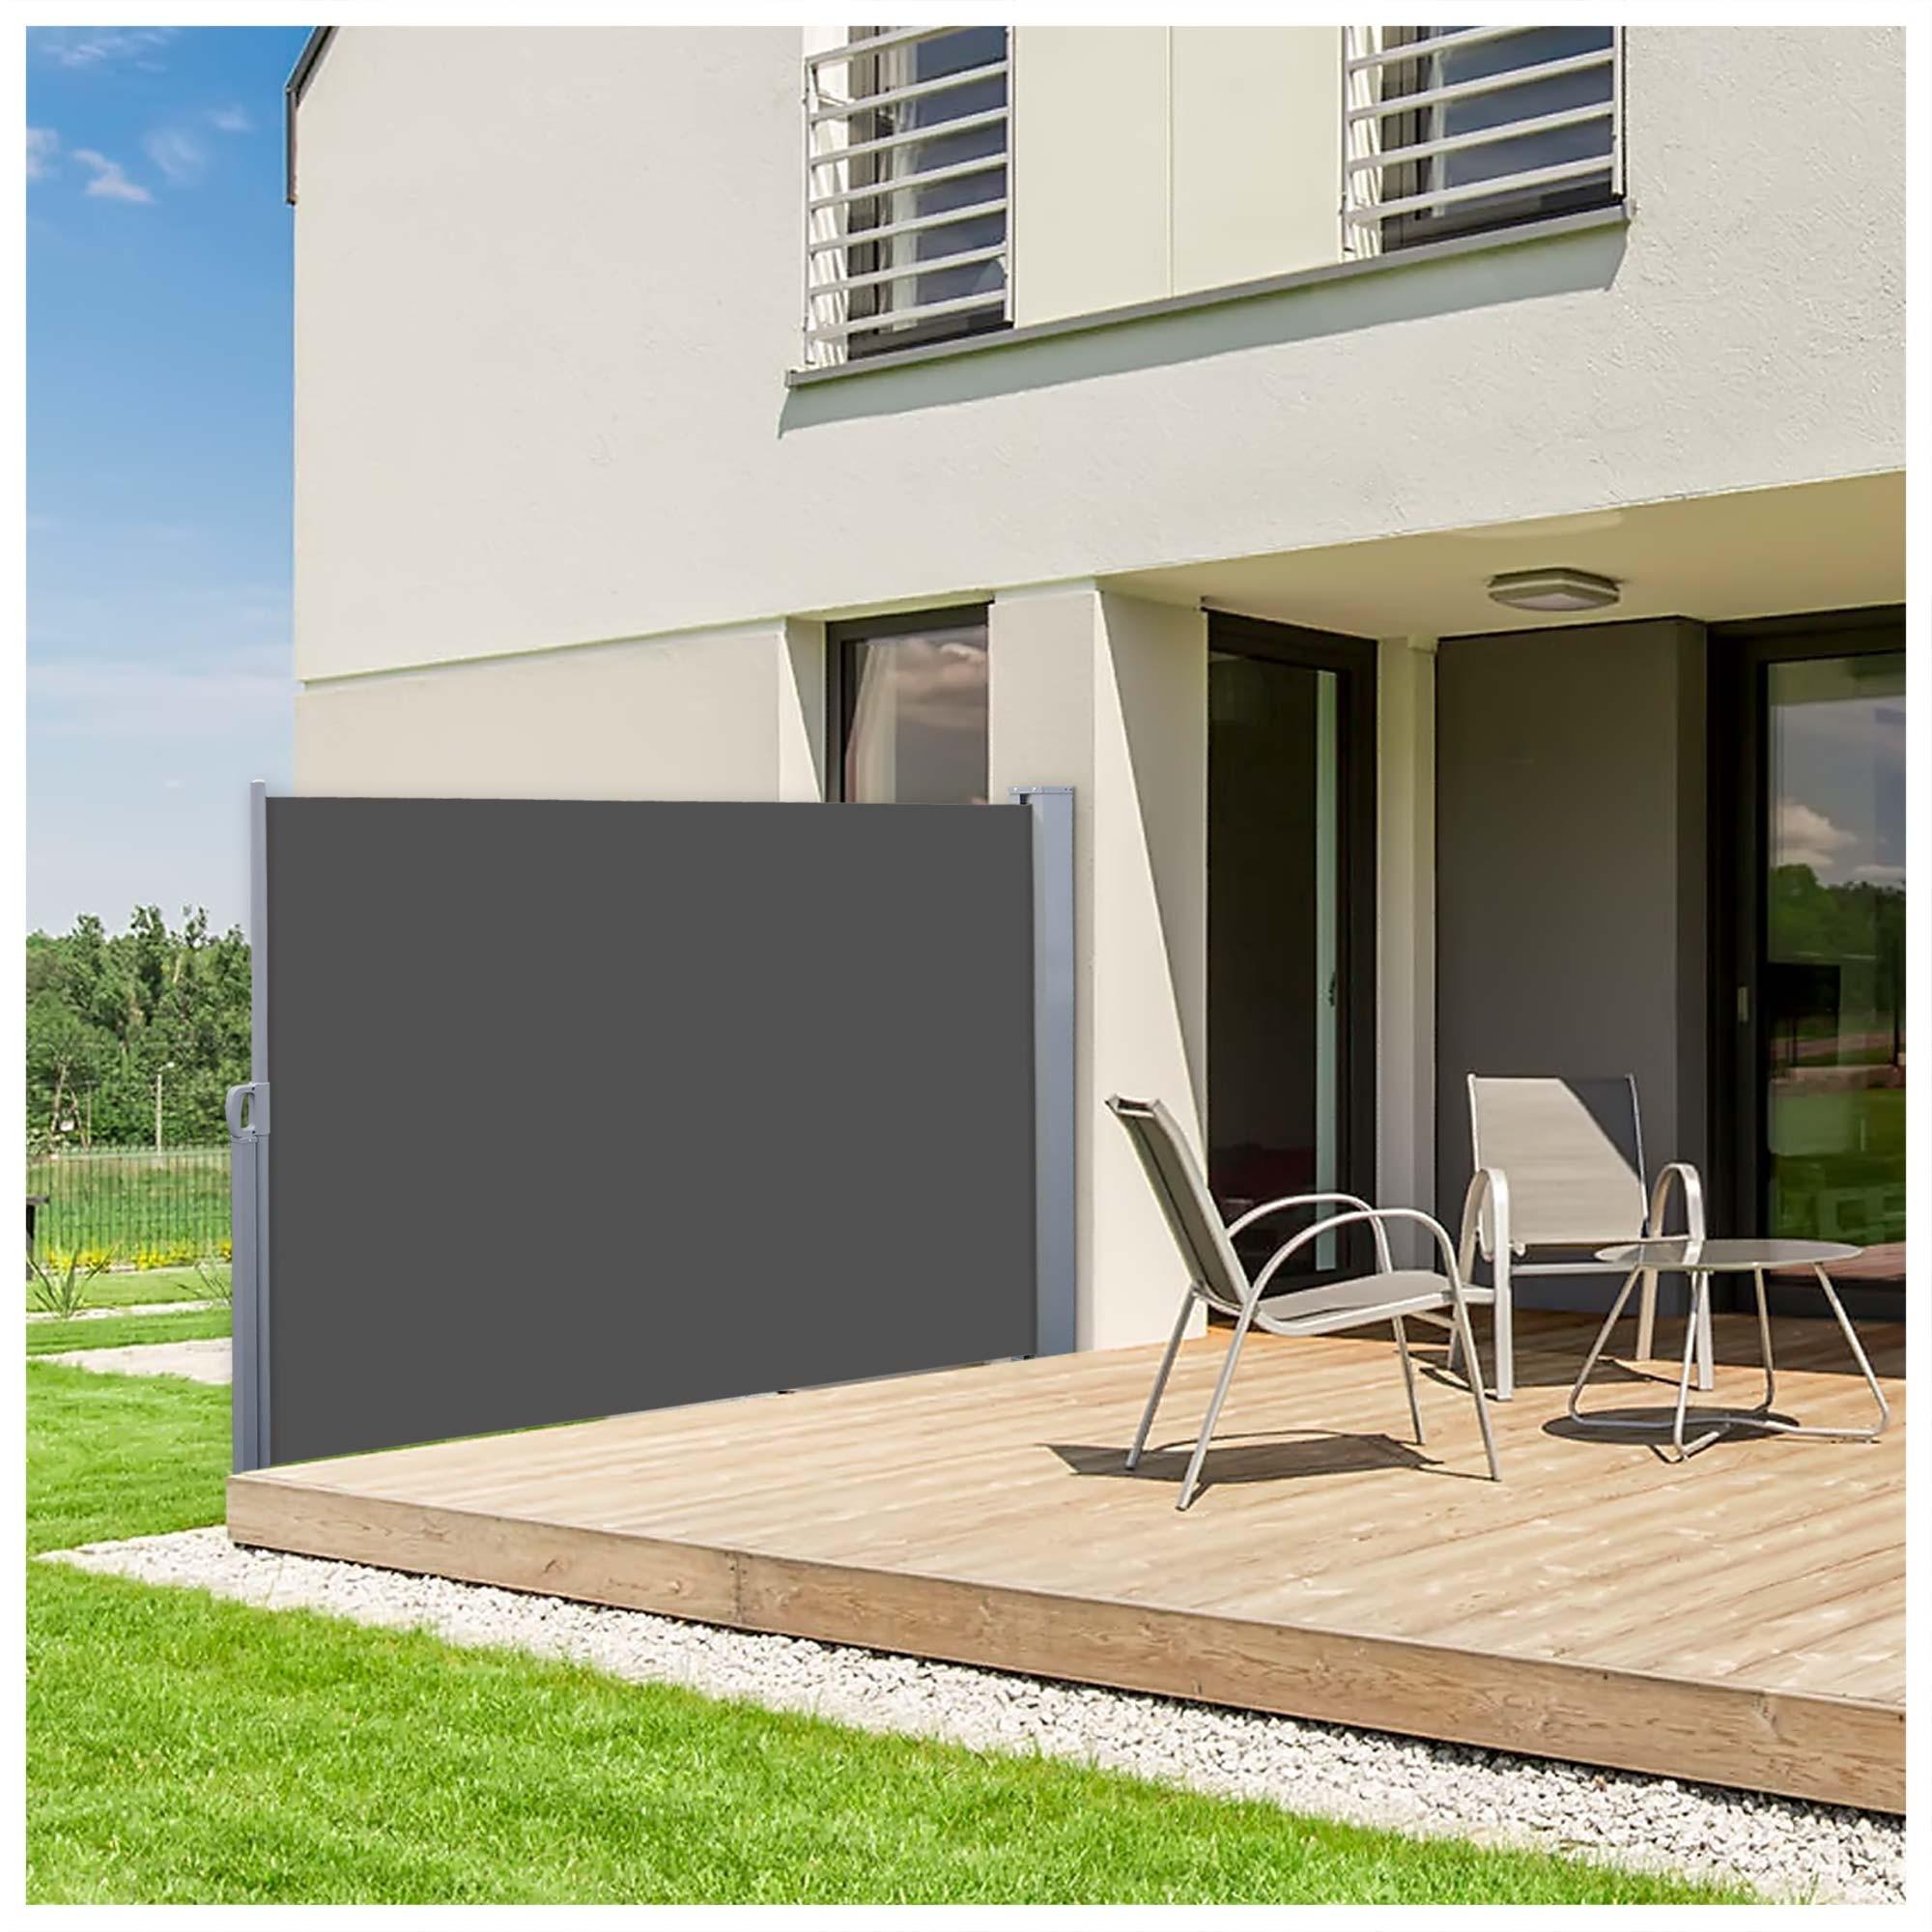 windschutz terrasse ausziehbar windschutz f 28 images. Black Bedroom Furniture Sets. Home Design Ideas